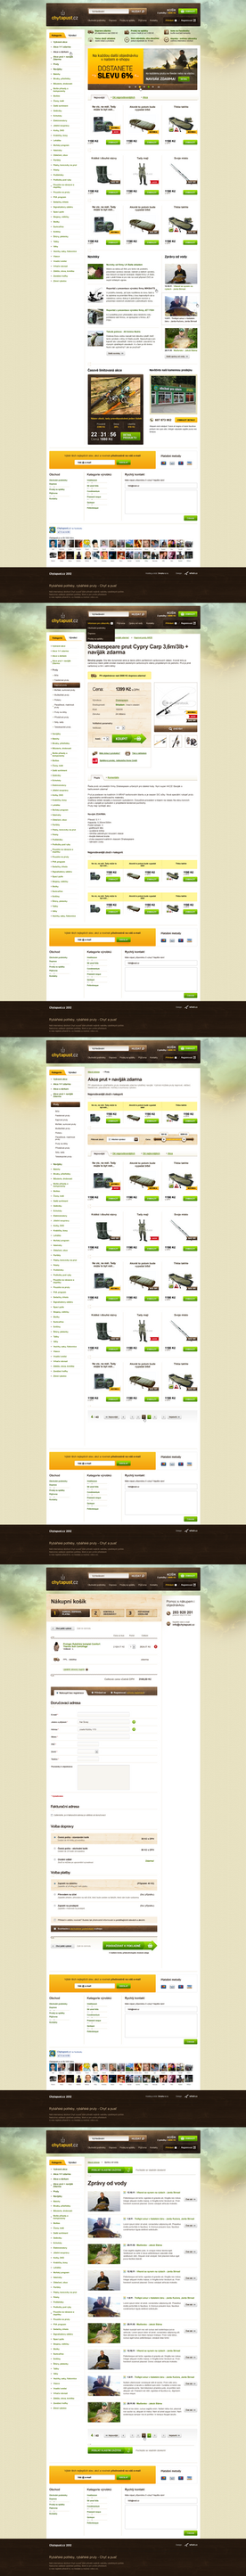 E-commerce fishing gear by lefiath